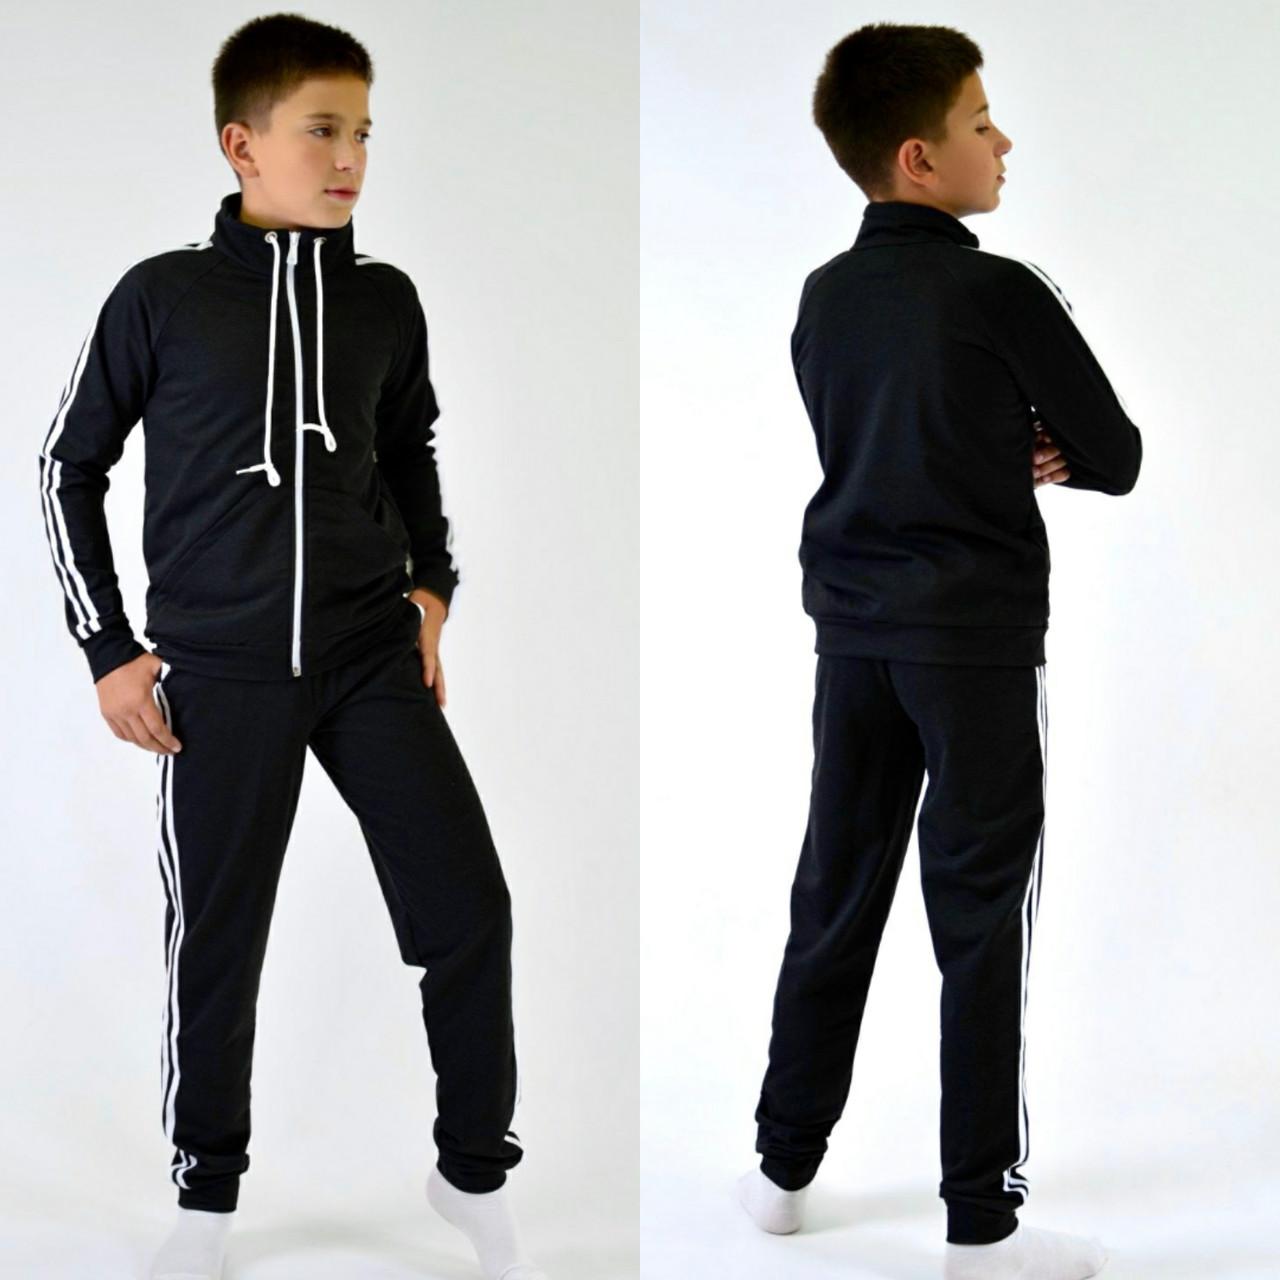 Спортивний костюм на хлопчика Атлетика 140, 146.